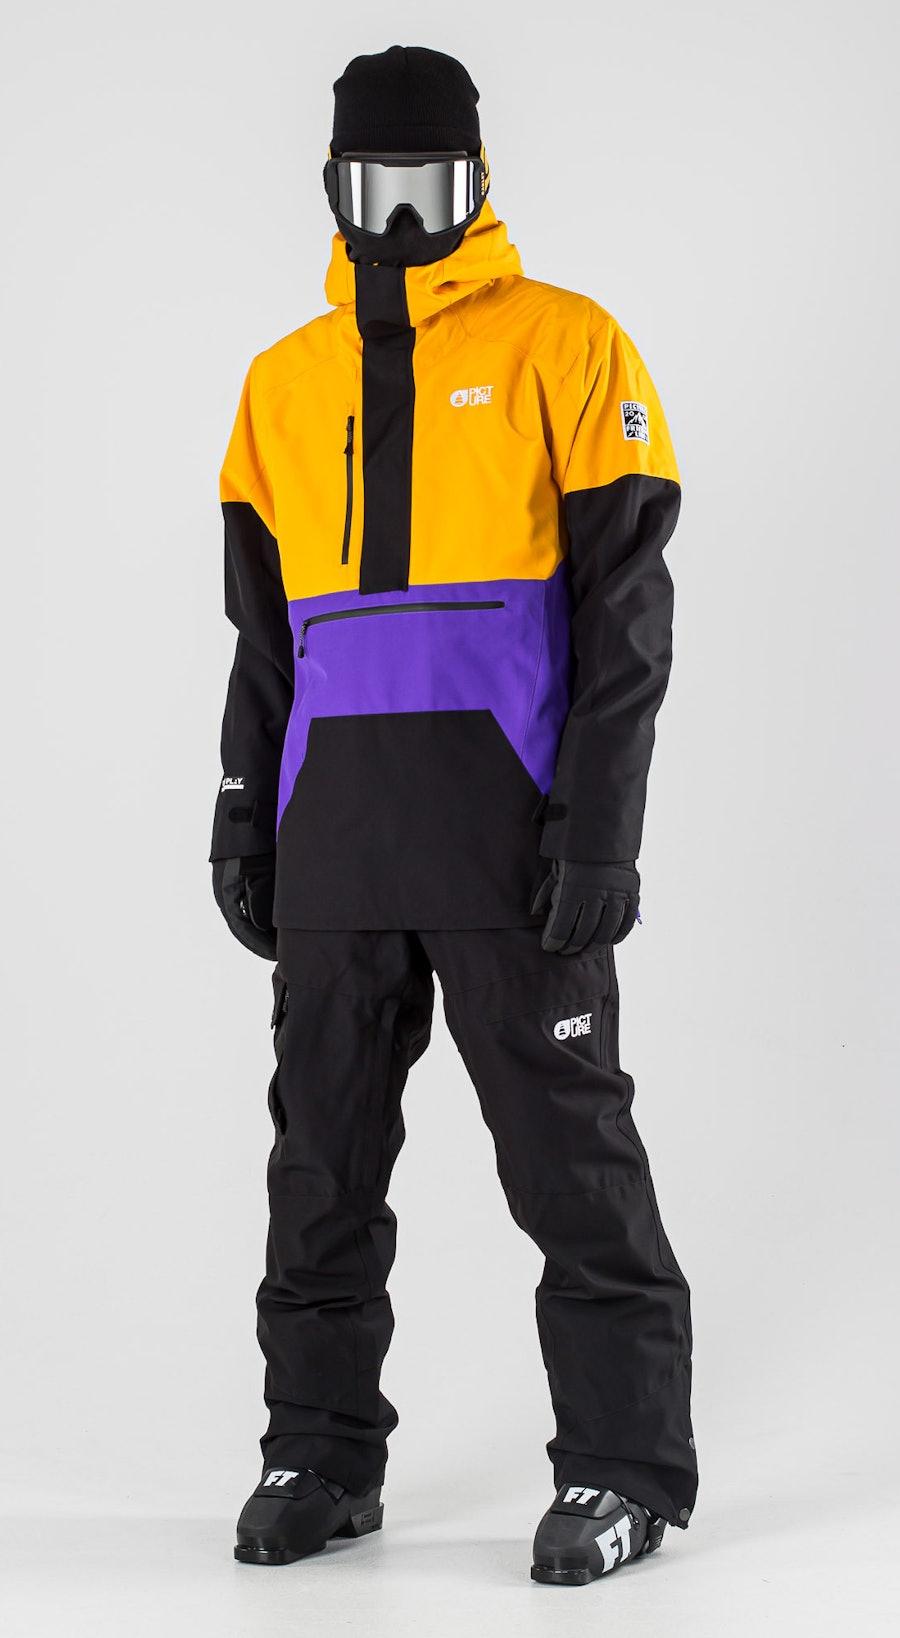 Picture Trifid Yellow Black Ski kleding Multi